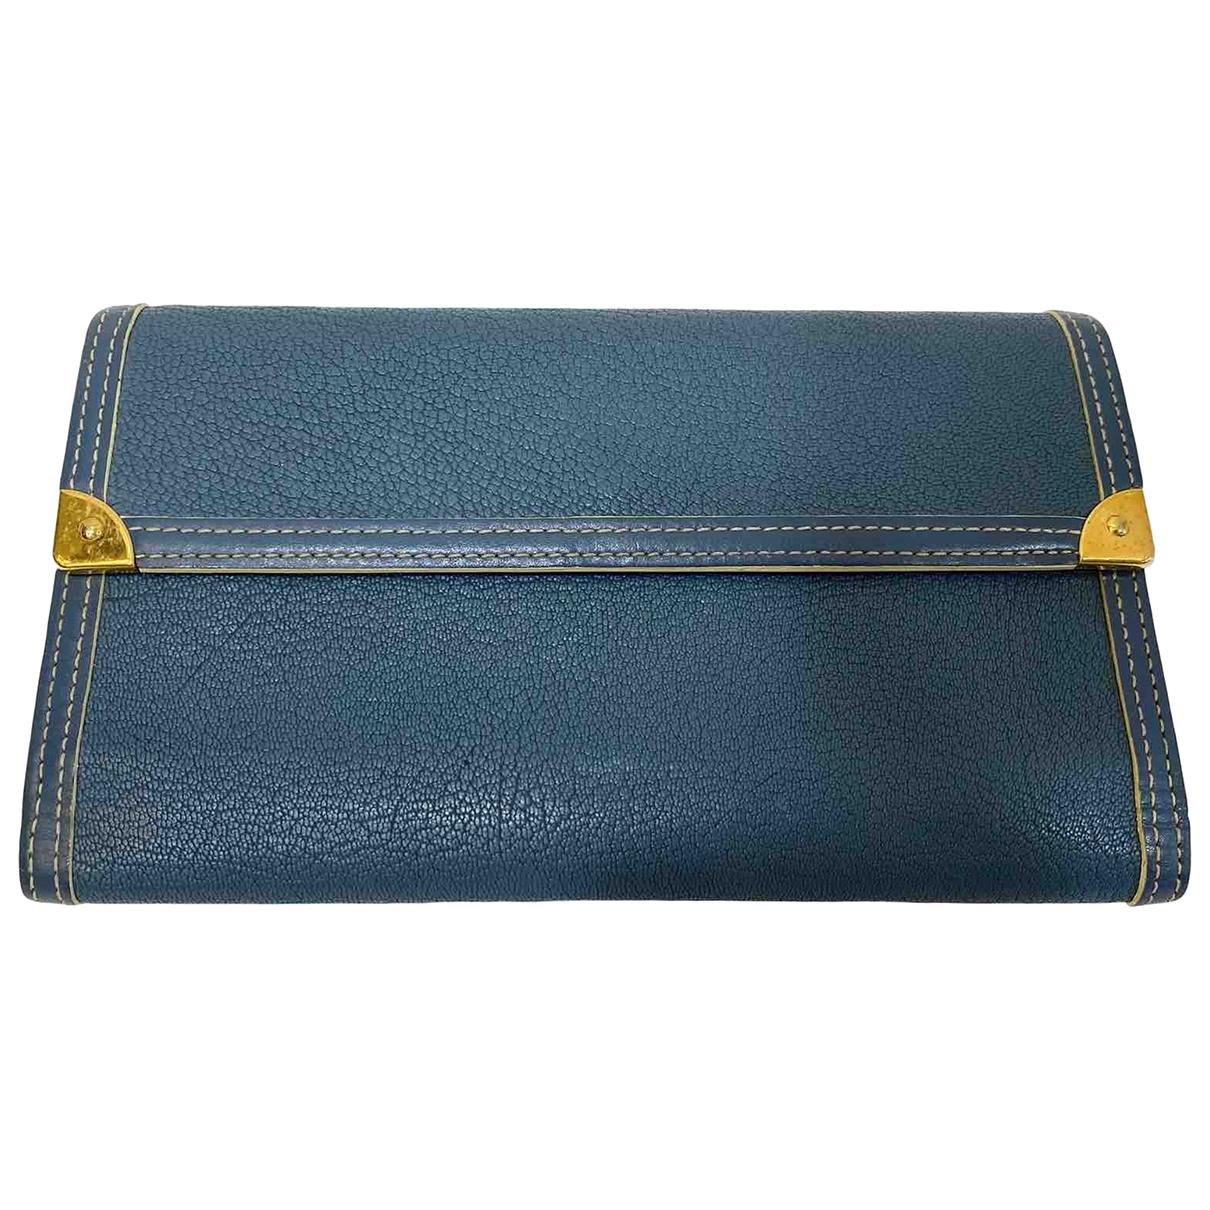 Louis Vuitton \N Blue Leather wallet for Women \N